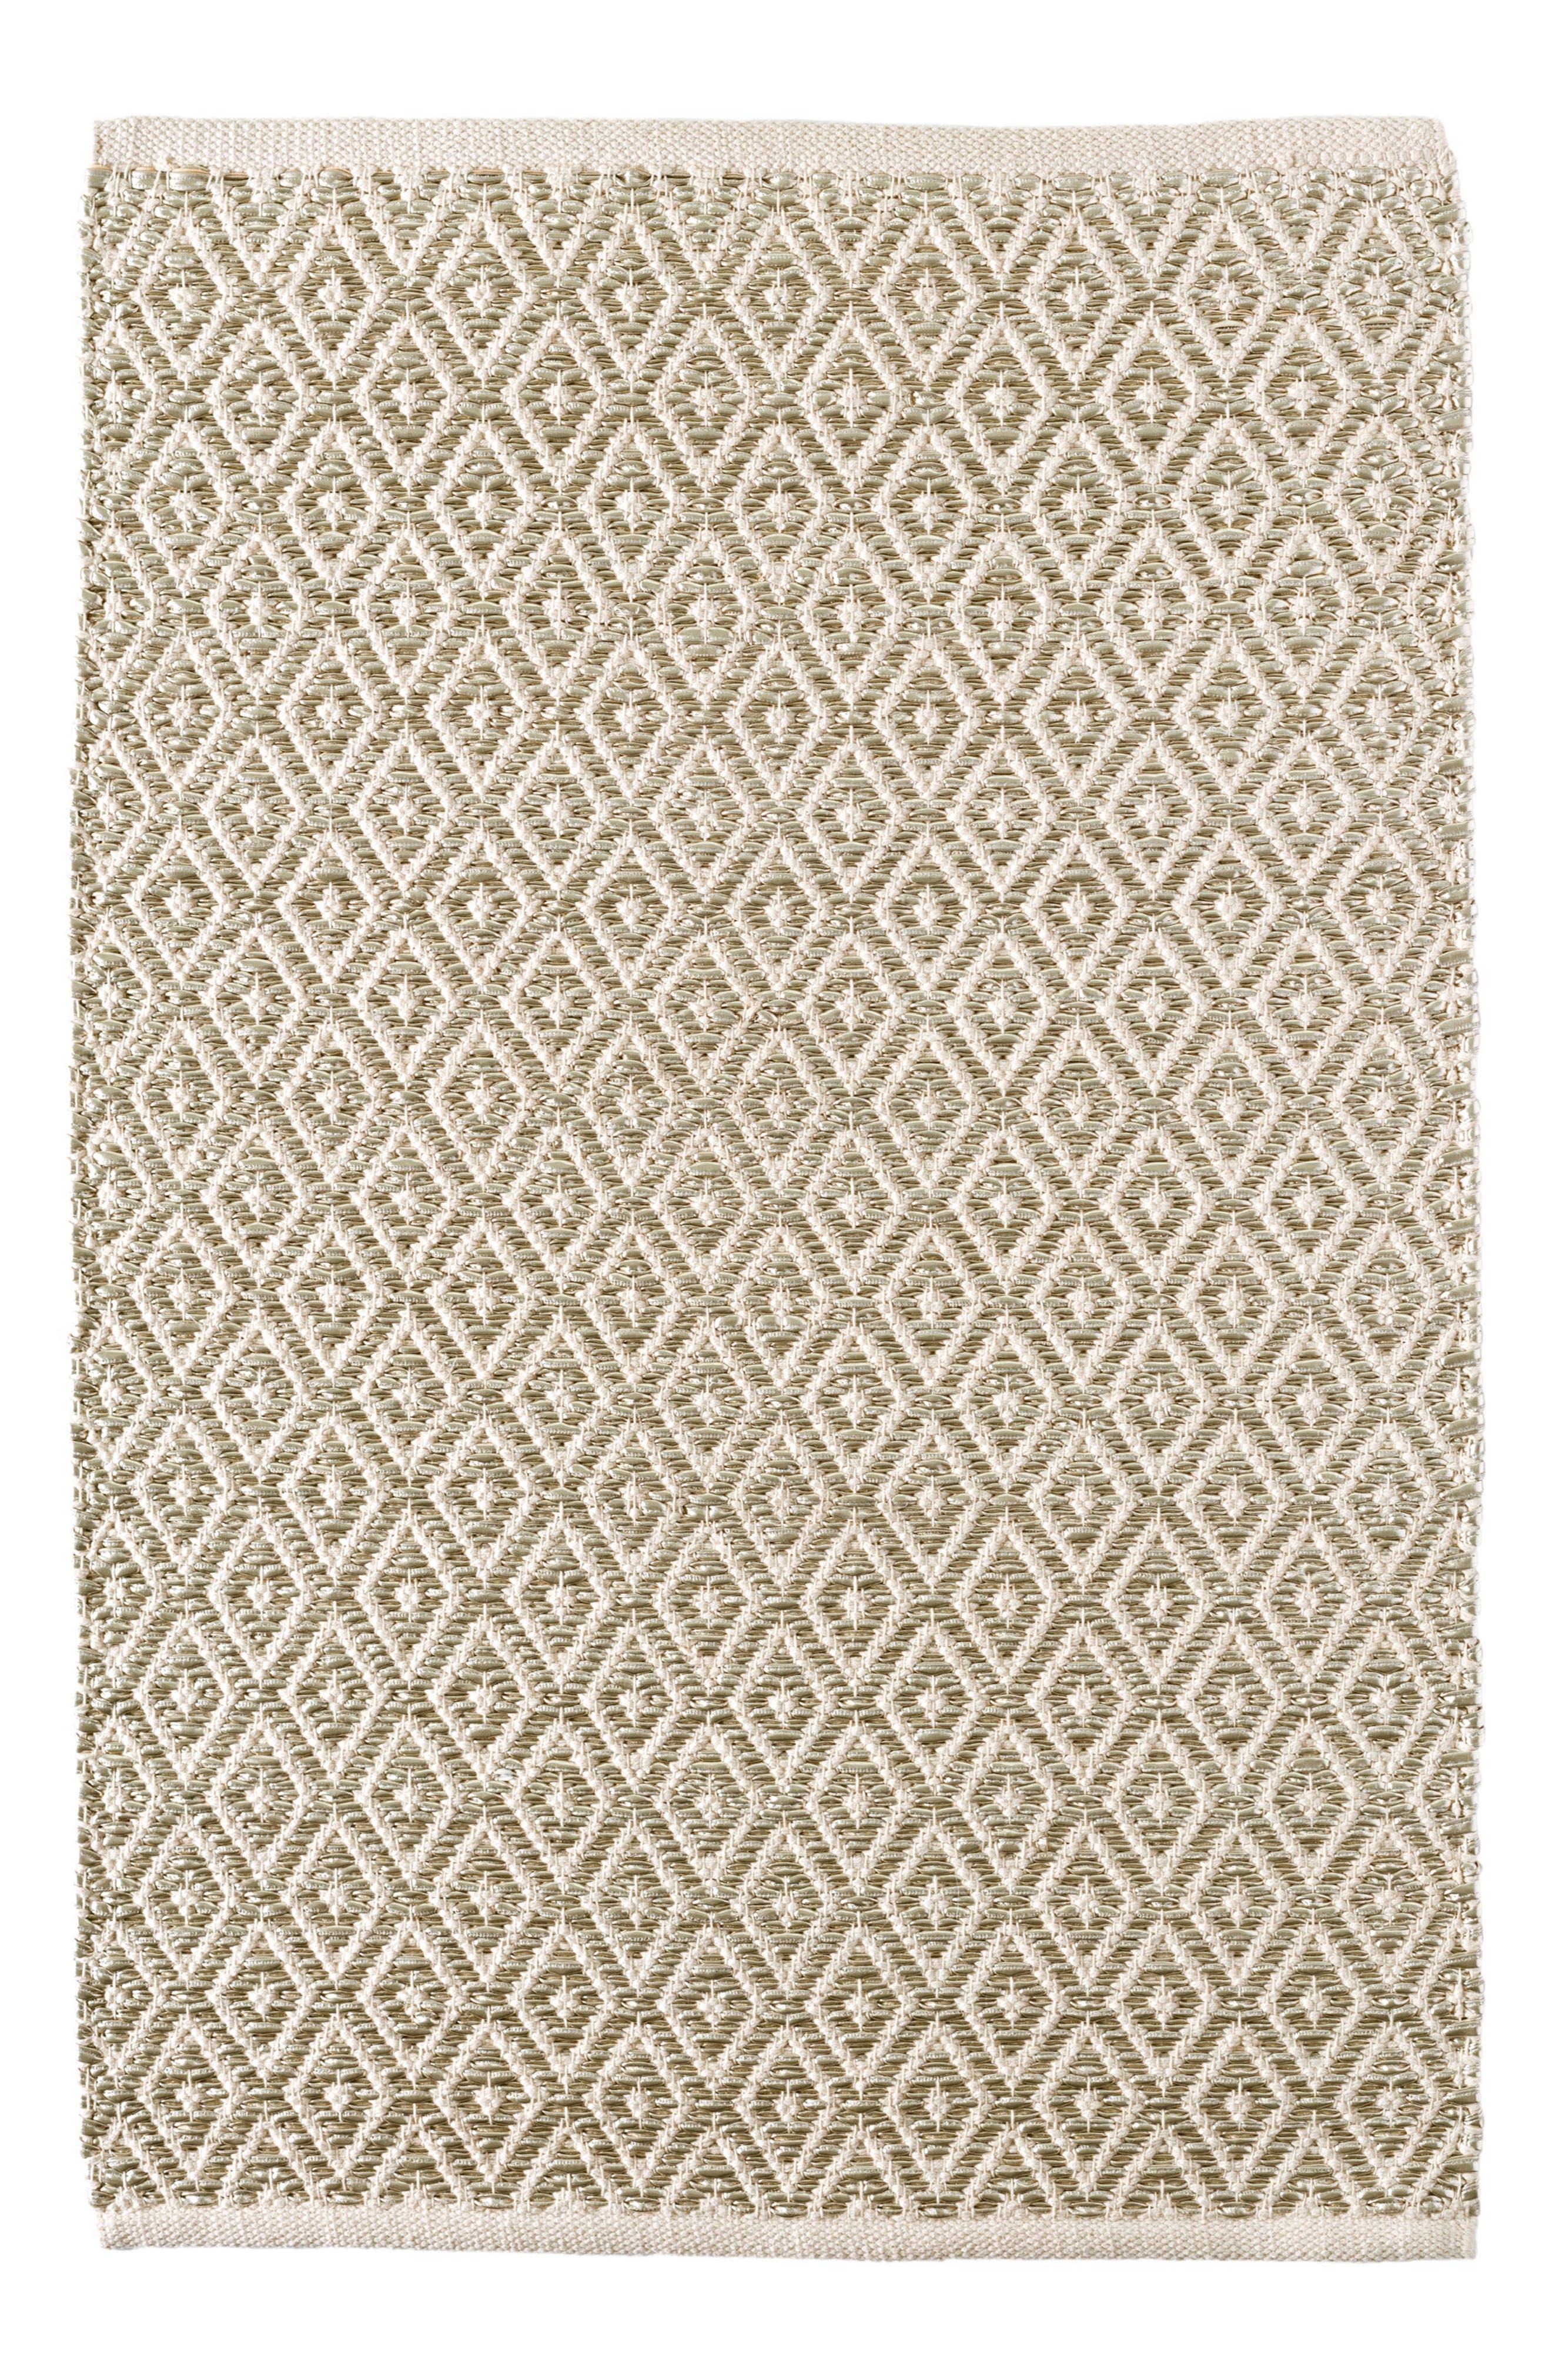 Glitter Diamond Woven Rug,                         Main,                         color, Metallic